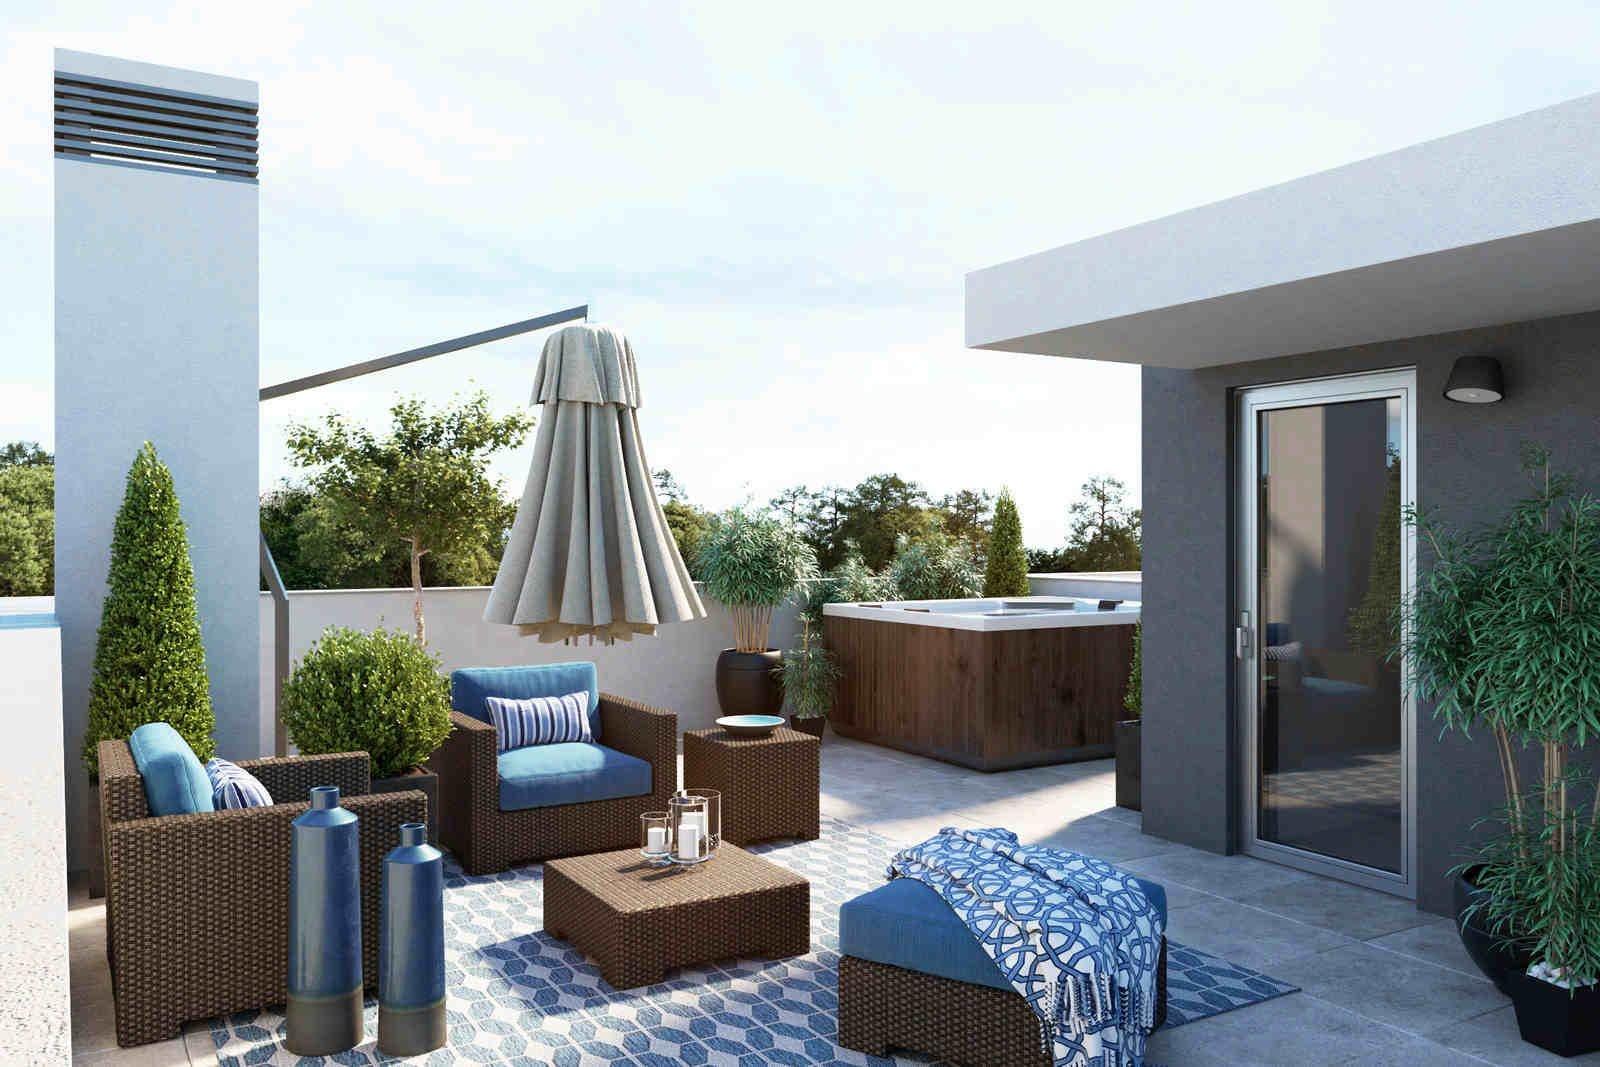 3 Bedroom Townhouse Tavira, Eastern Algarve Ref: PV3521